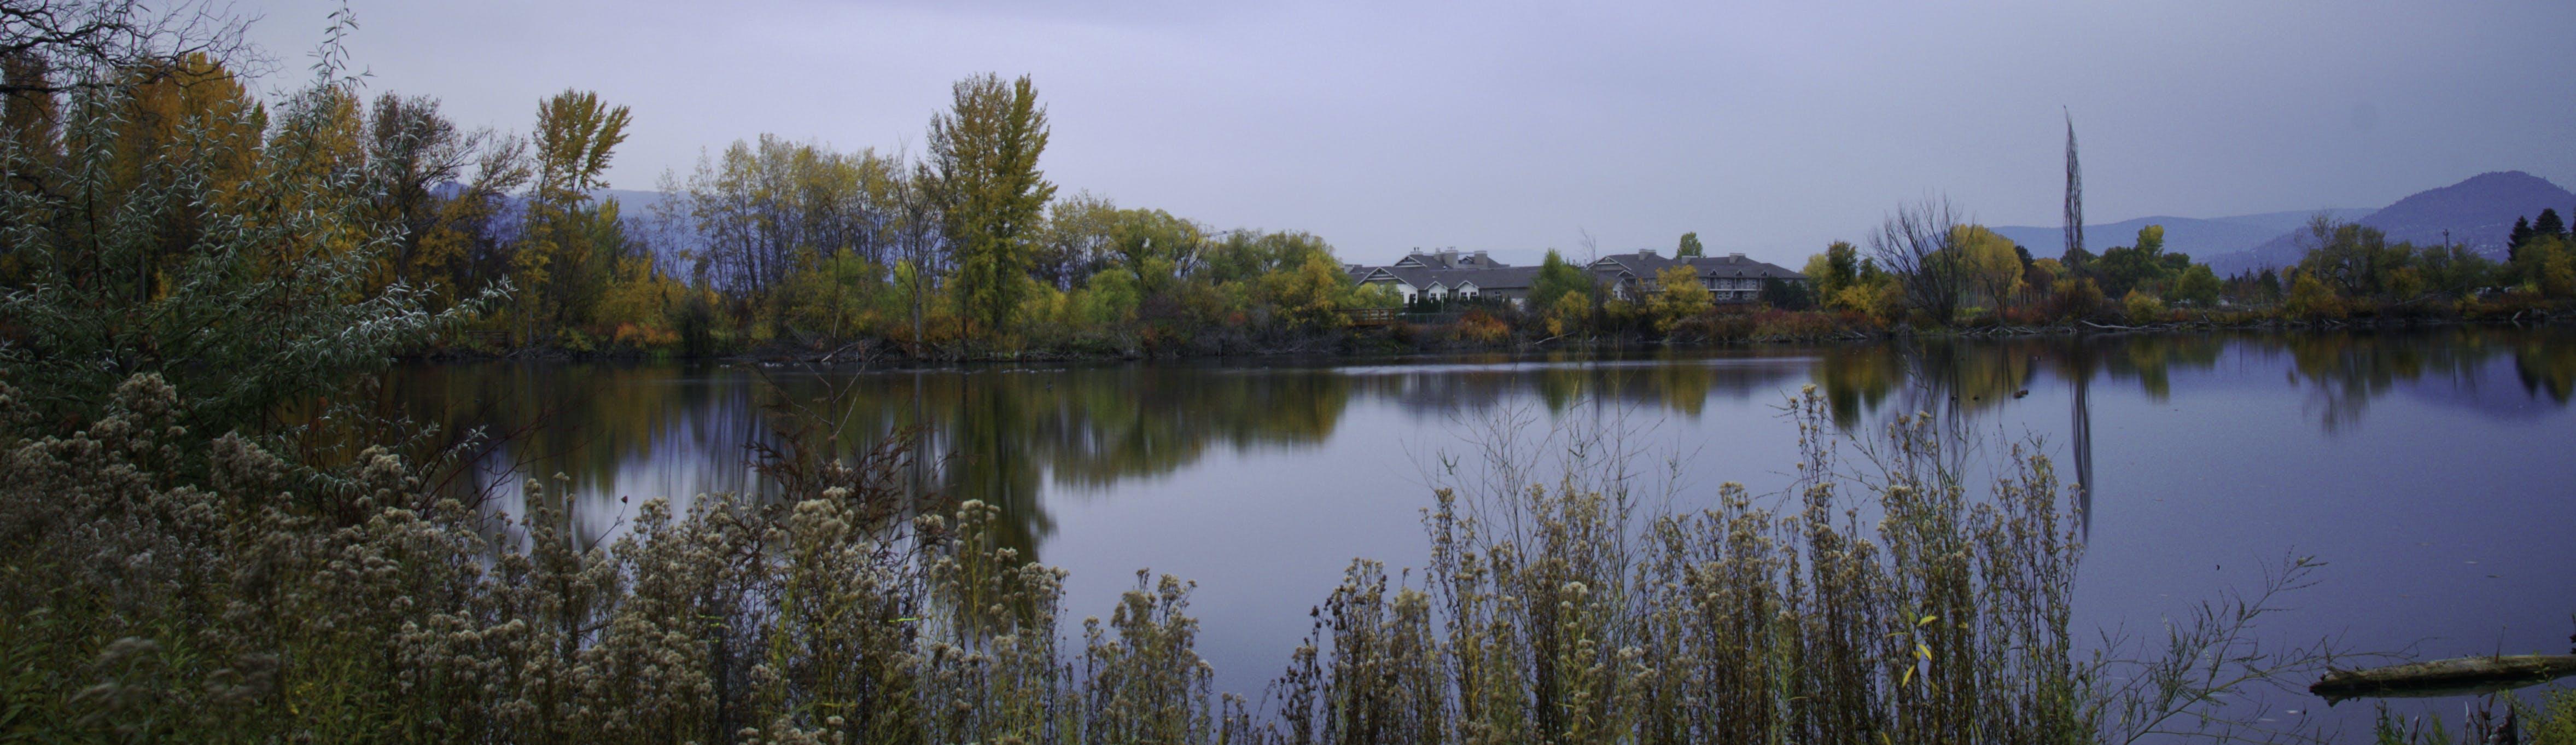 Free stock photo of lake trees brush sky pond fall water colour